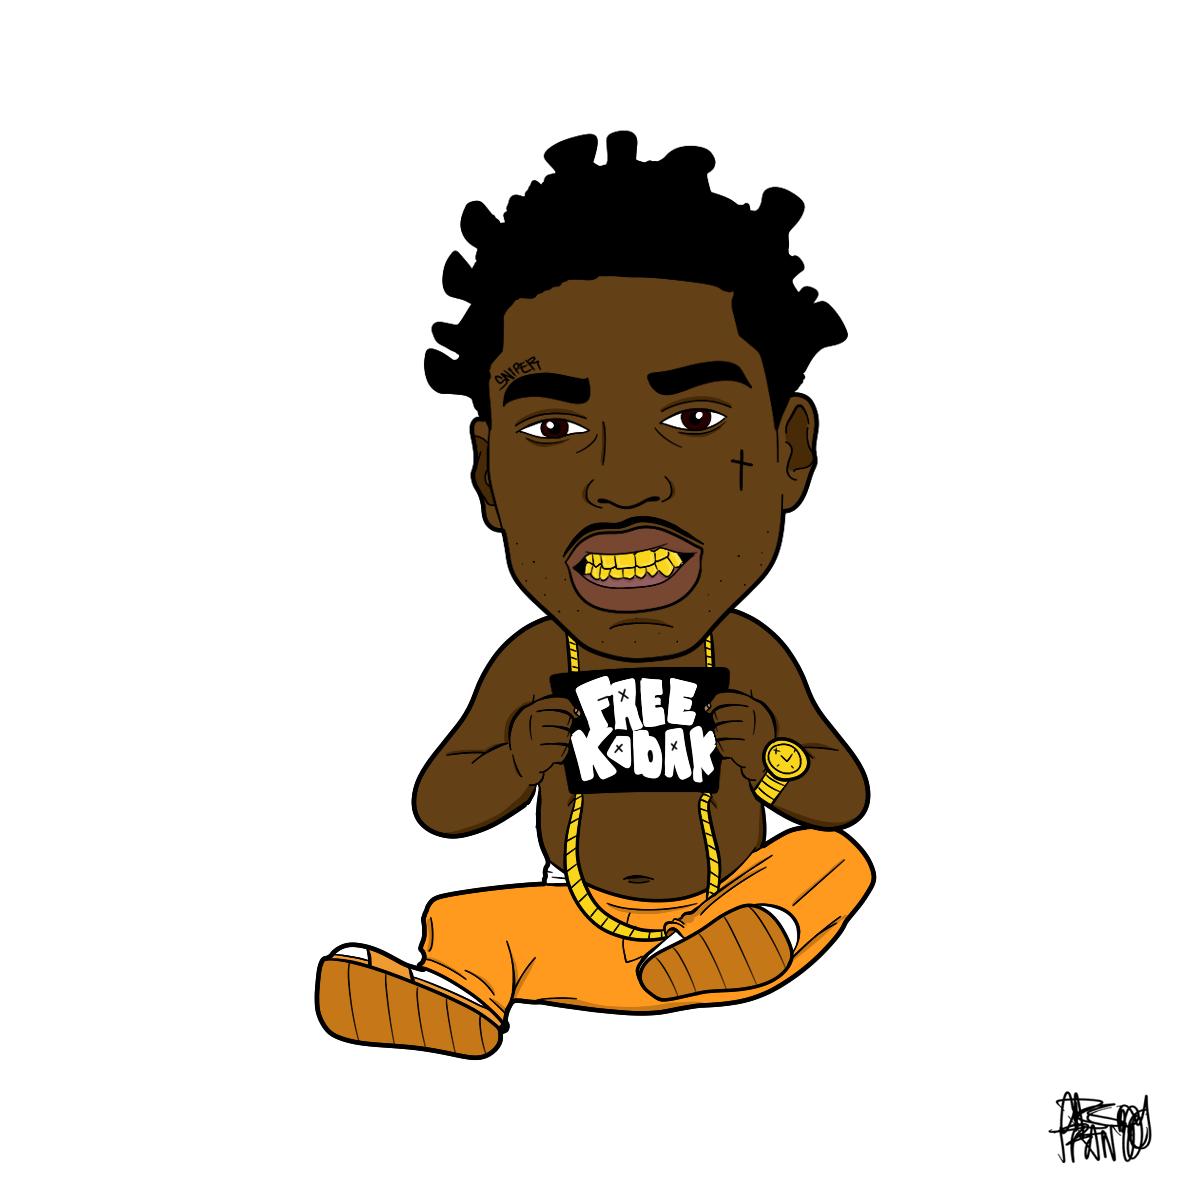 cartoon kodak drawing wallpapers rappers boy rapper drawings artwork artists florida south cave easy